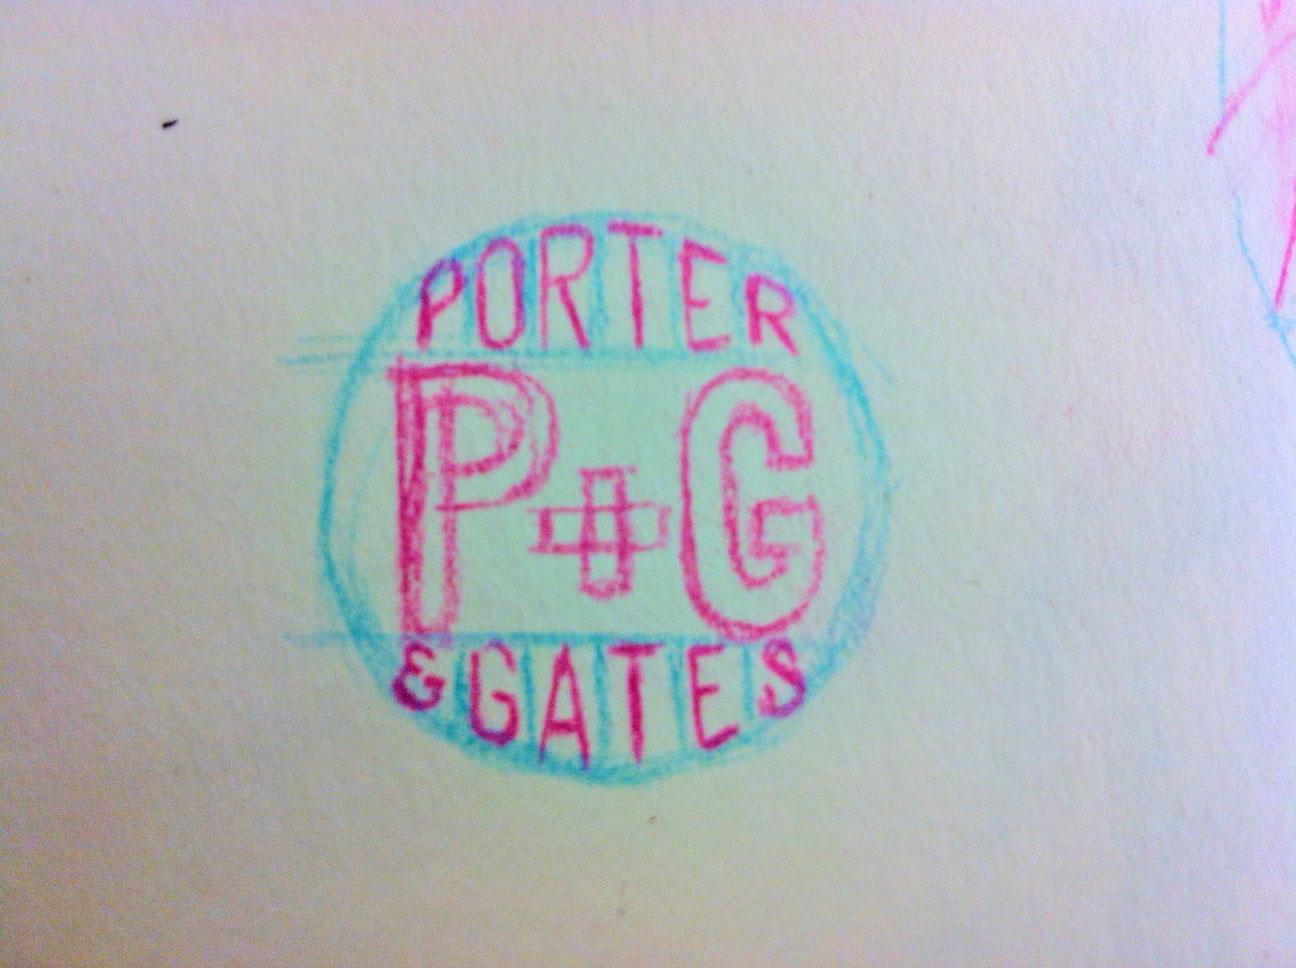 Porter+Gates Logo Sketches - image 3 - student project